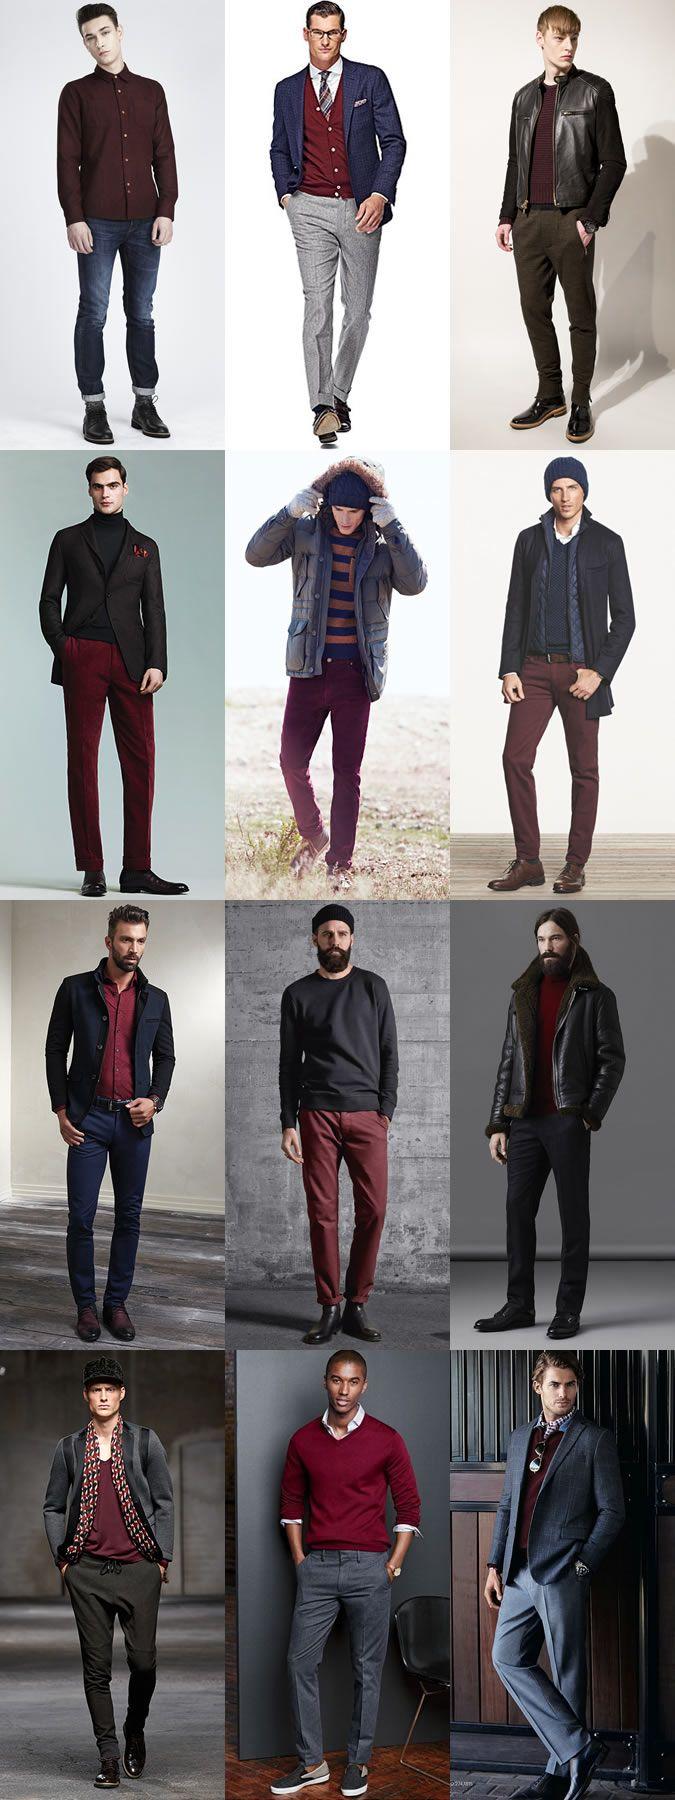 Burgundy Velvet Jumper Mens - Sweater Jeans And Boots